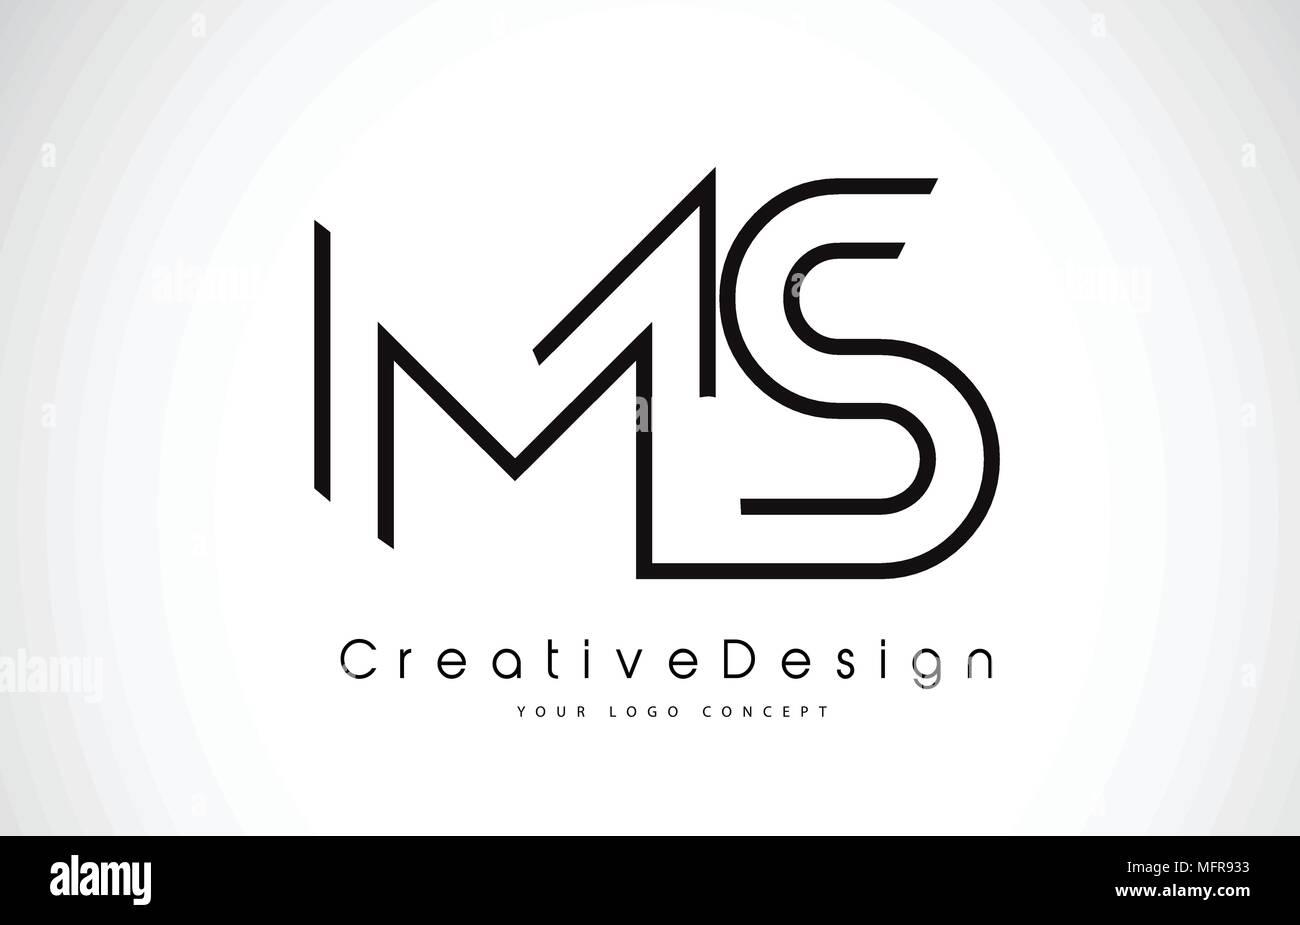 ms m s letter logo design in black colors creative modern letters